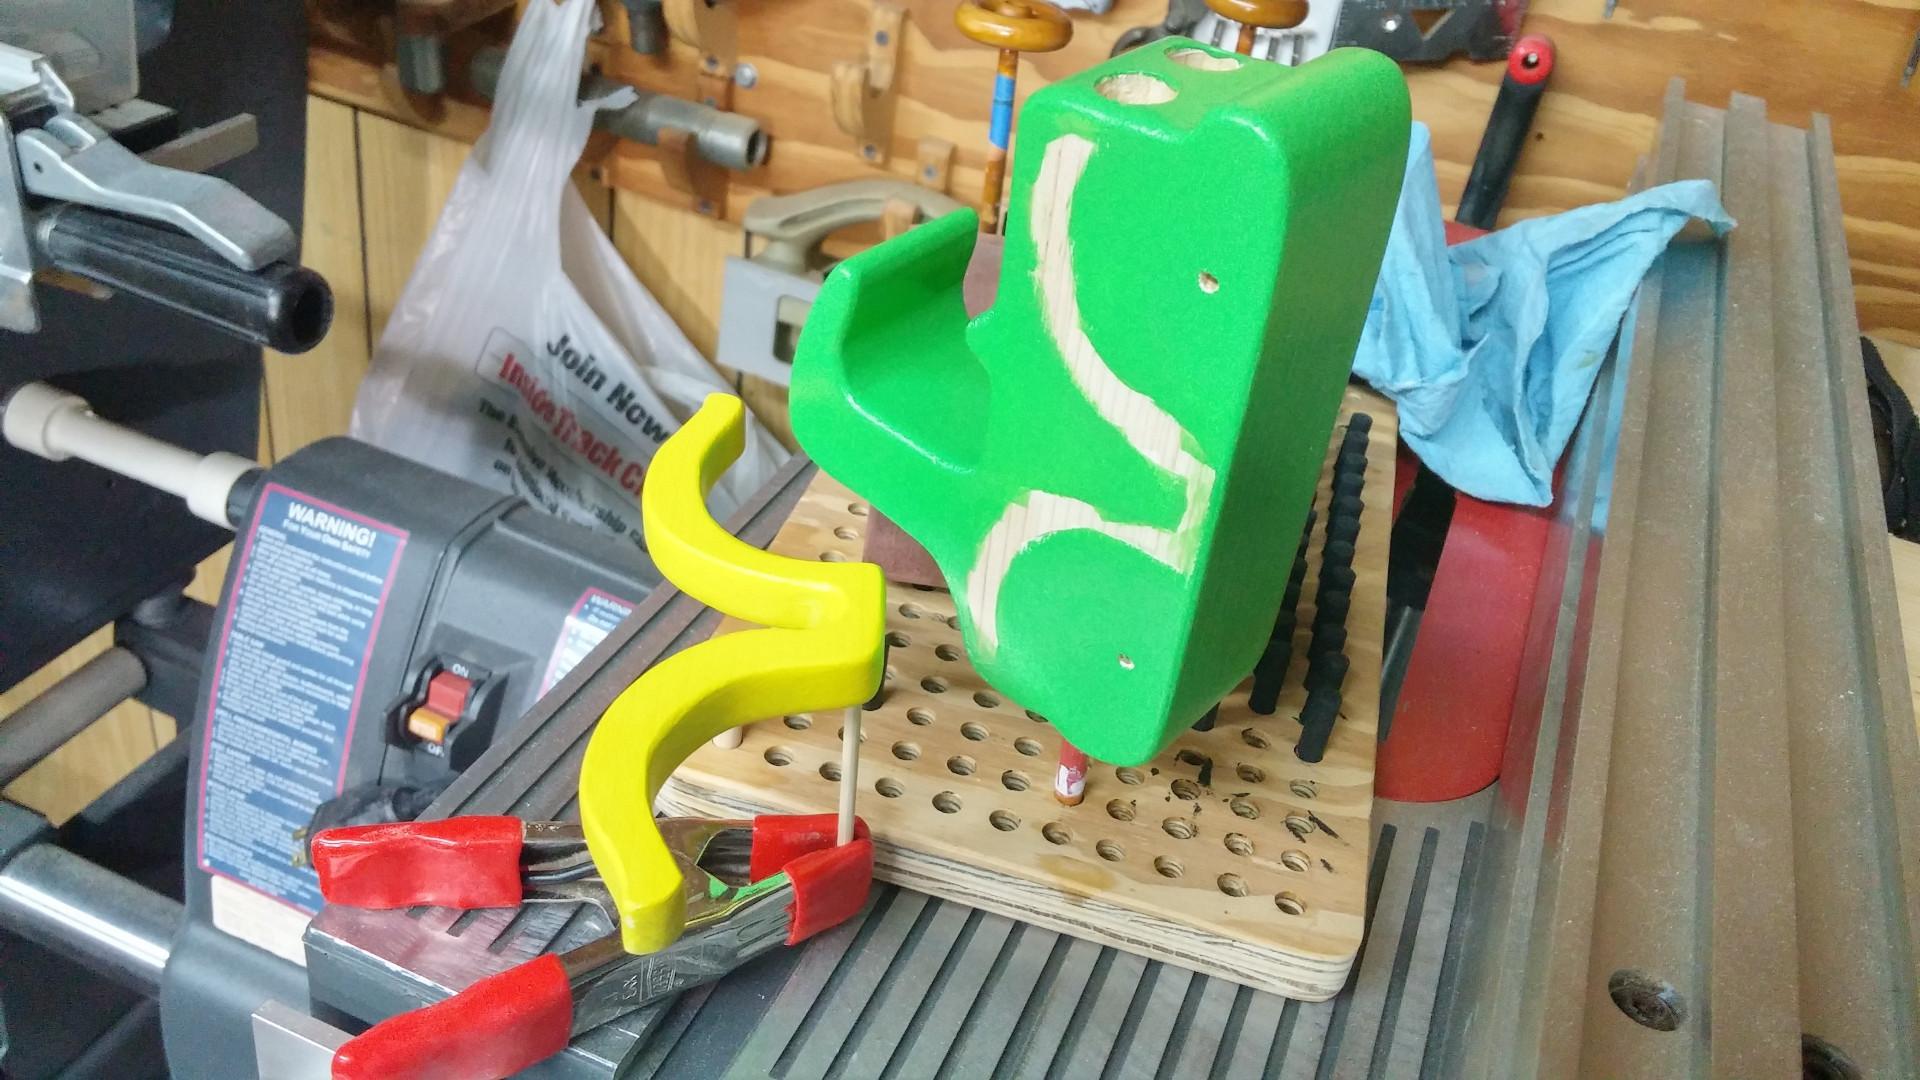 20180314_205314_HDR Handmade Wooden Toy Car Bad Bobs Custom Motors Gre.jpg